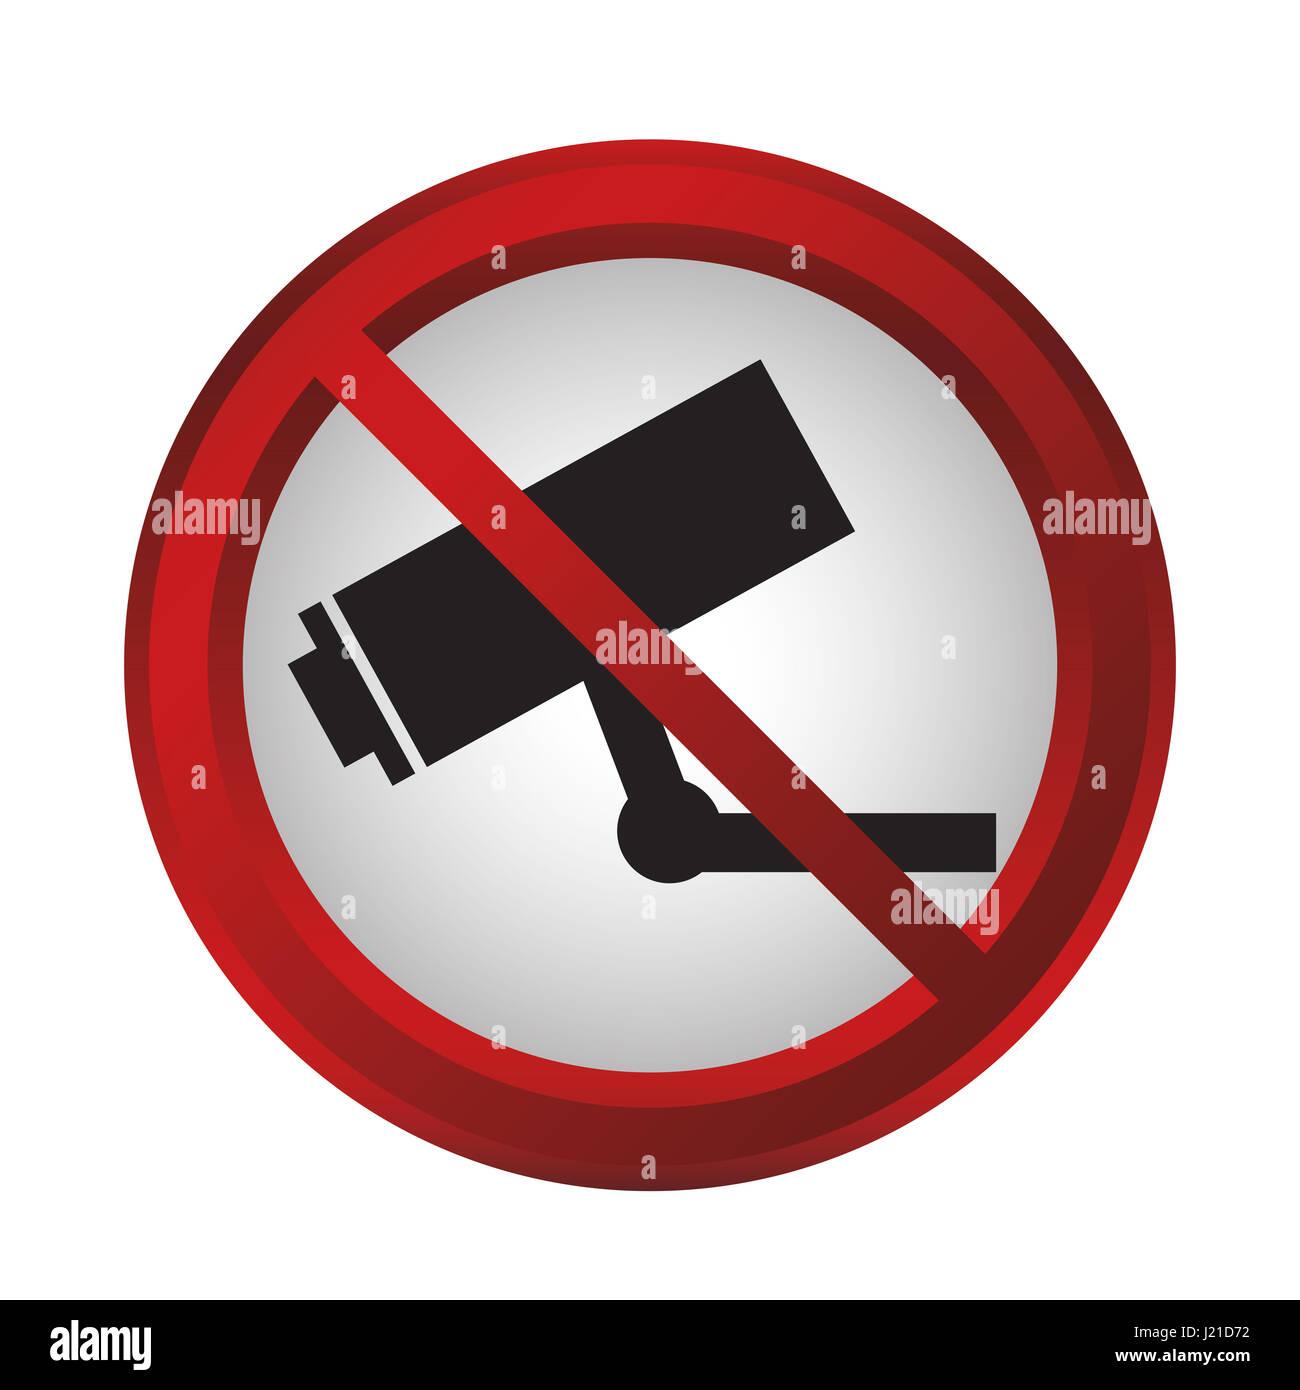 forbidden signs design - Stock Image